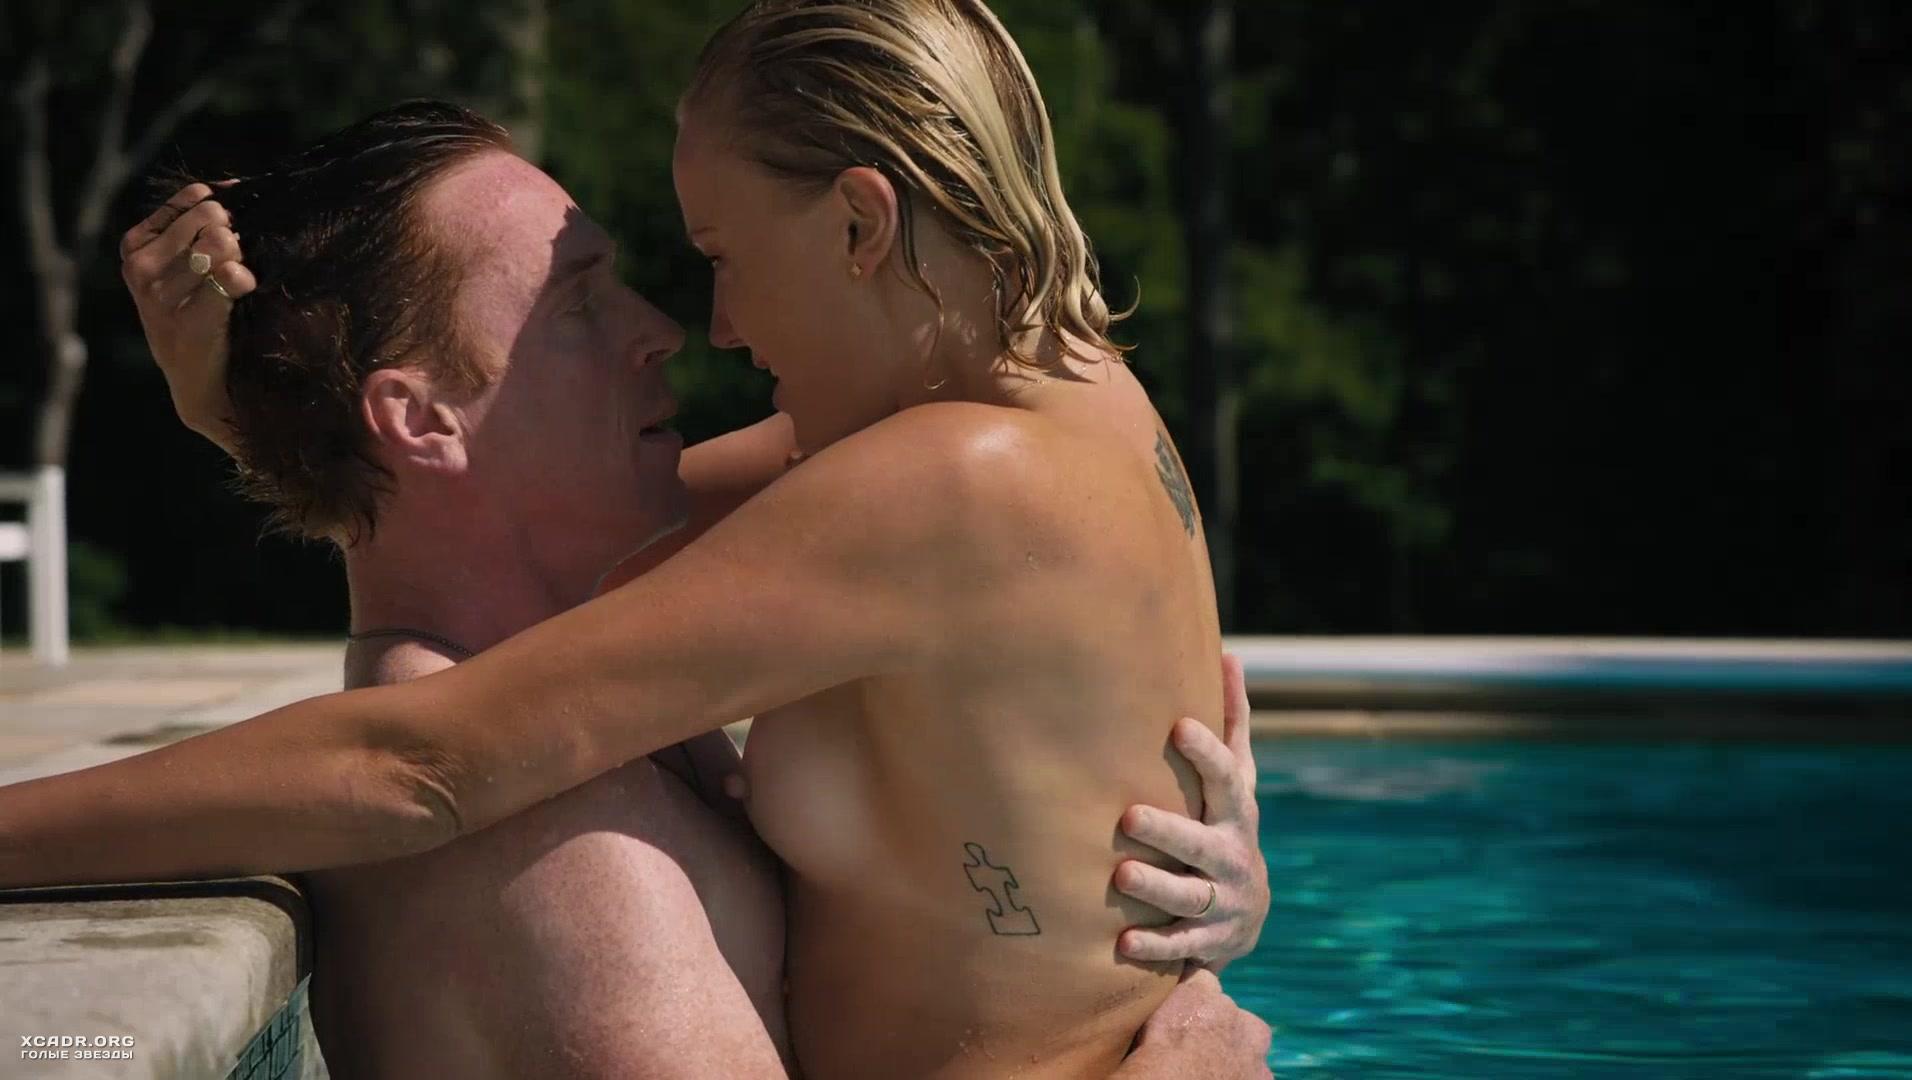 alpha-sex-scene-video-pool-oral-motor-goals